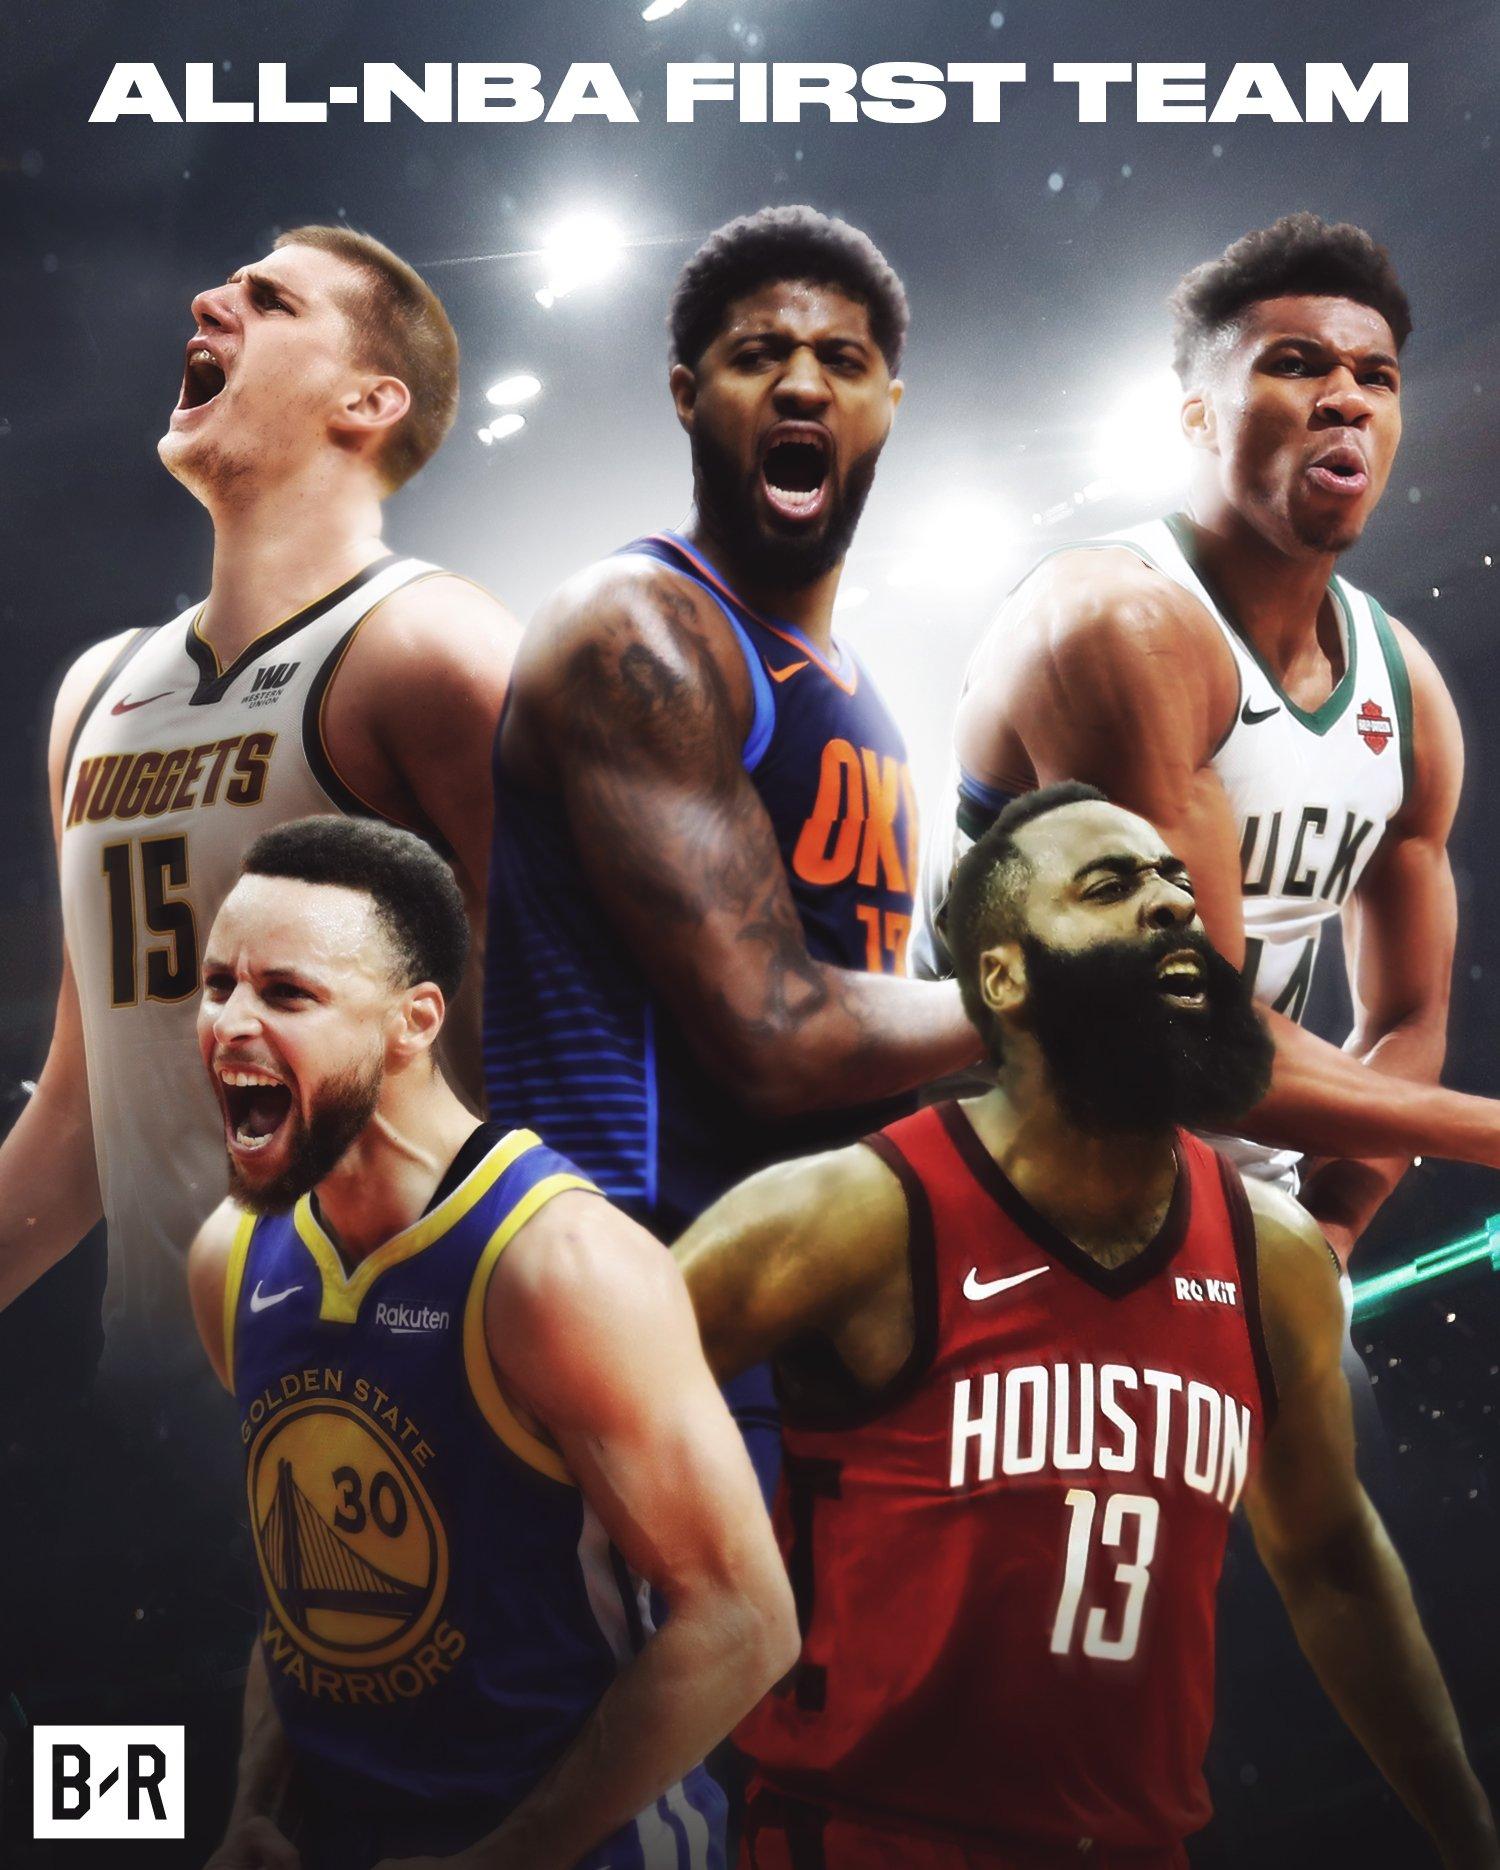 The league's best of 2018-19 https://t.co/ElDs89tQd0